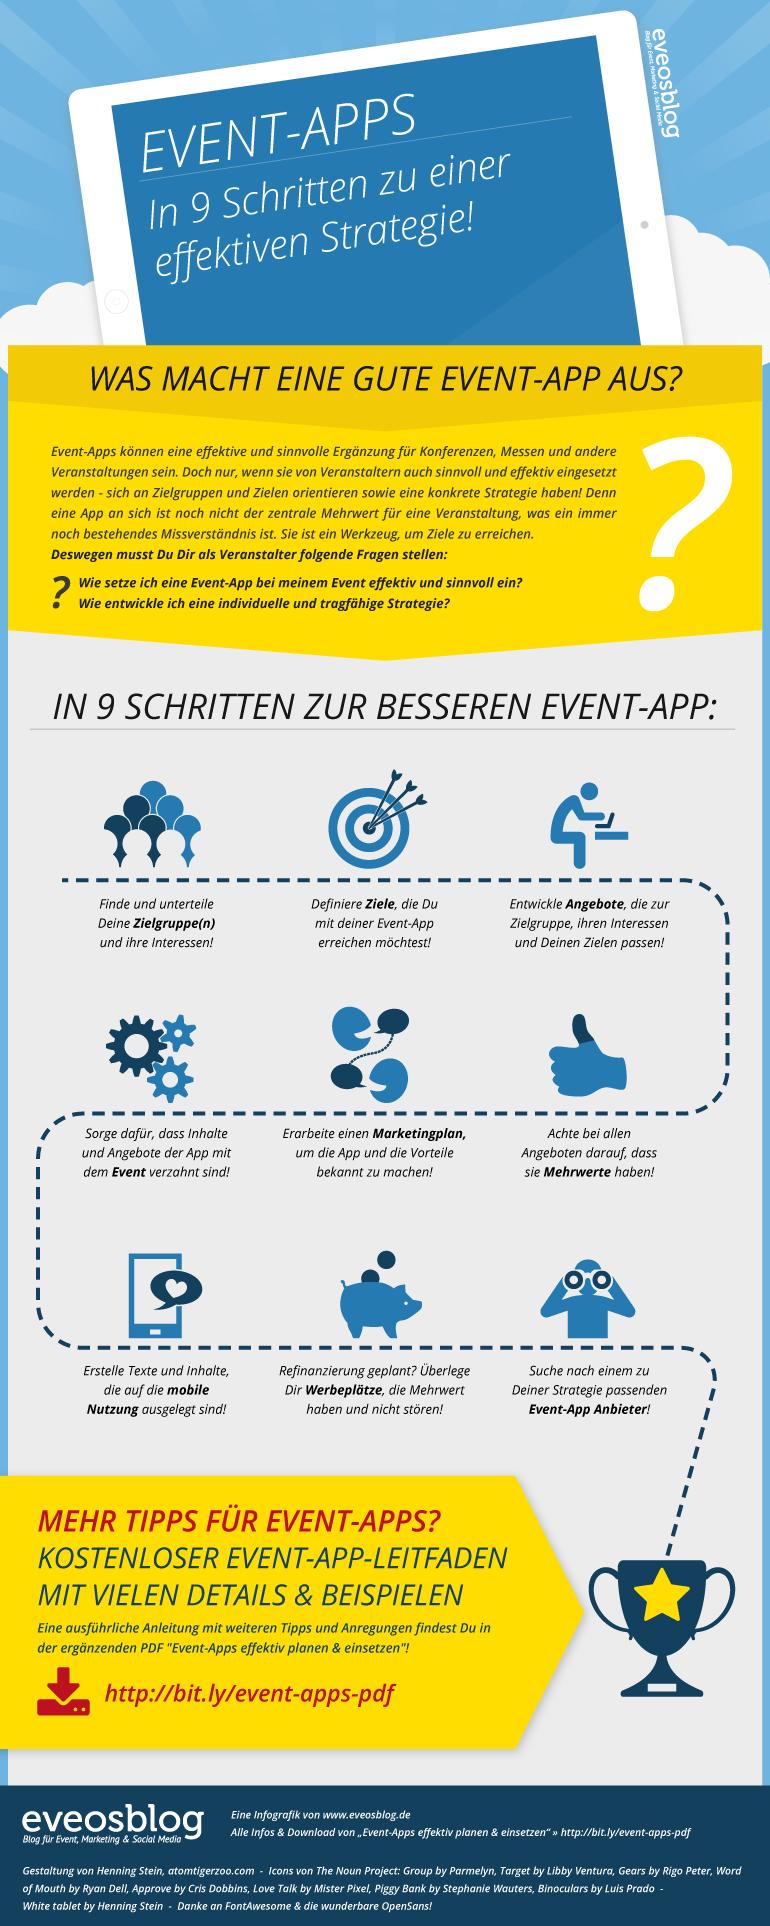 event-apps strategie entwickeln infografik